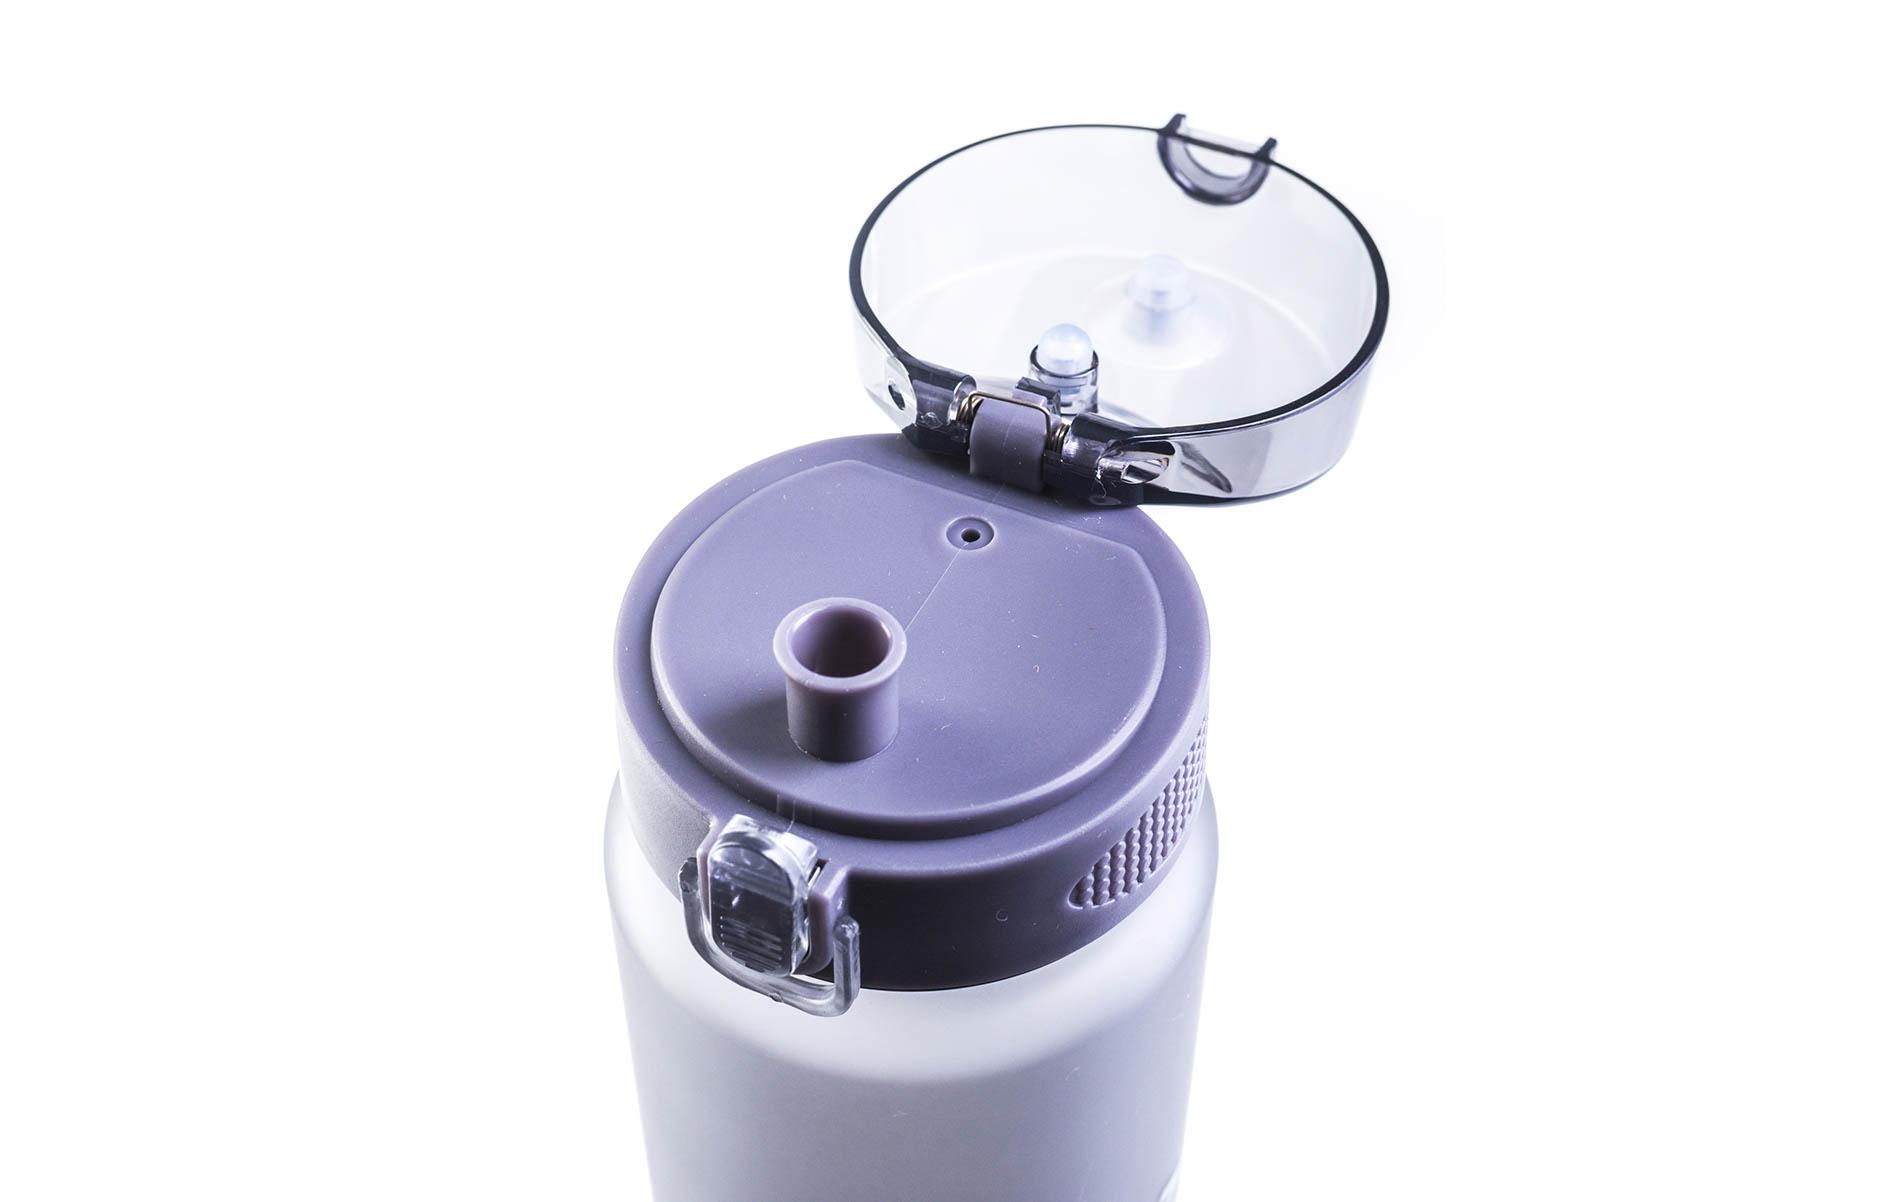 Láhev G21 neobsahuje škodlivé látky BPA